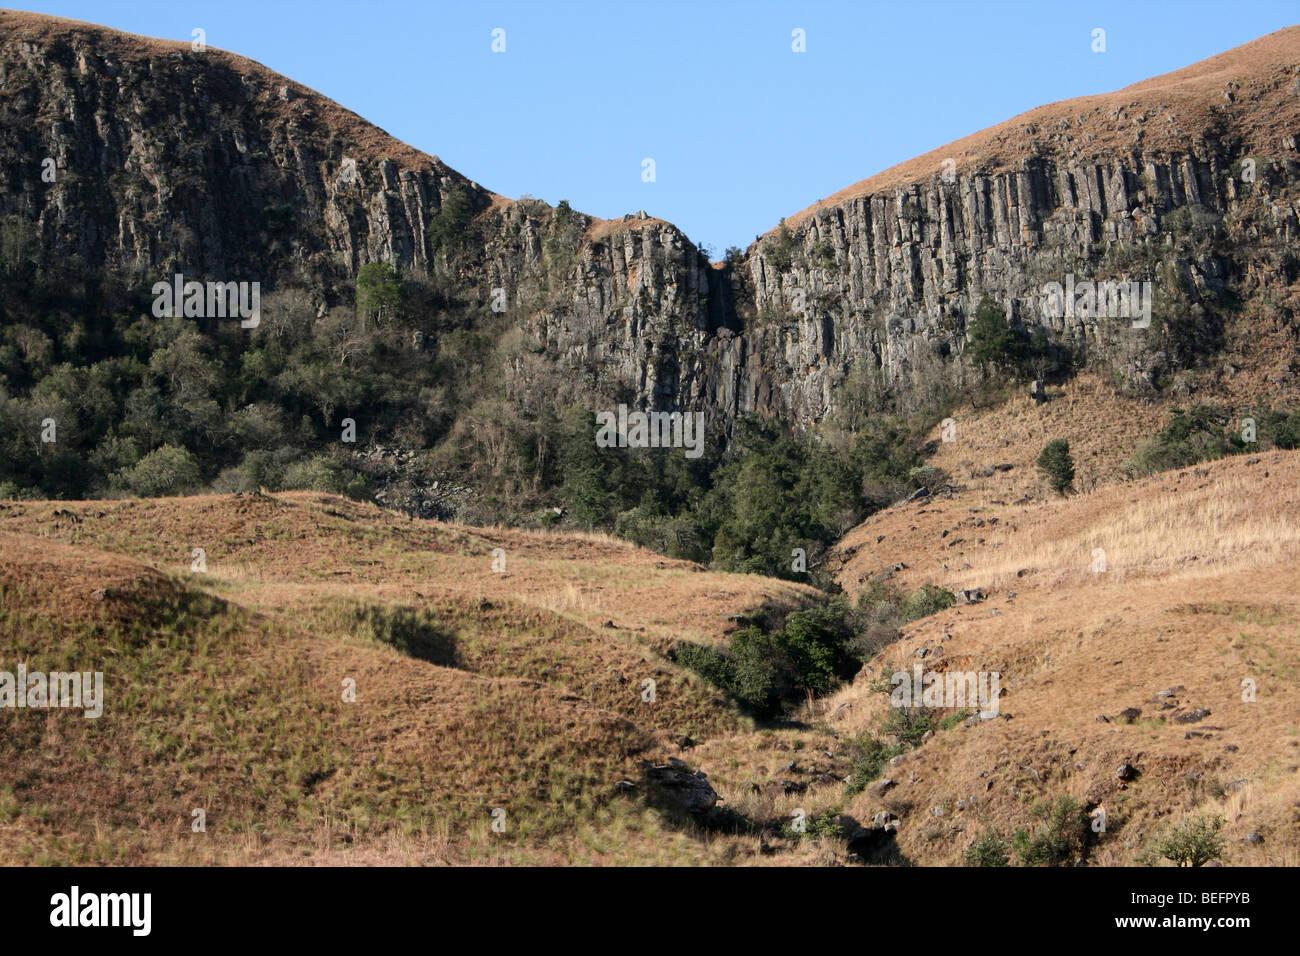 Basalt Columns In The Drakensberg Mountains, South Africa Stock Photo